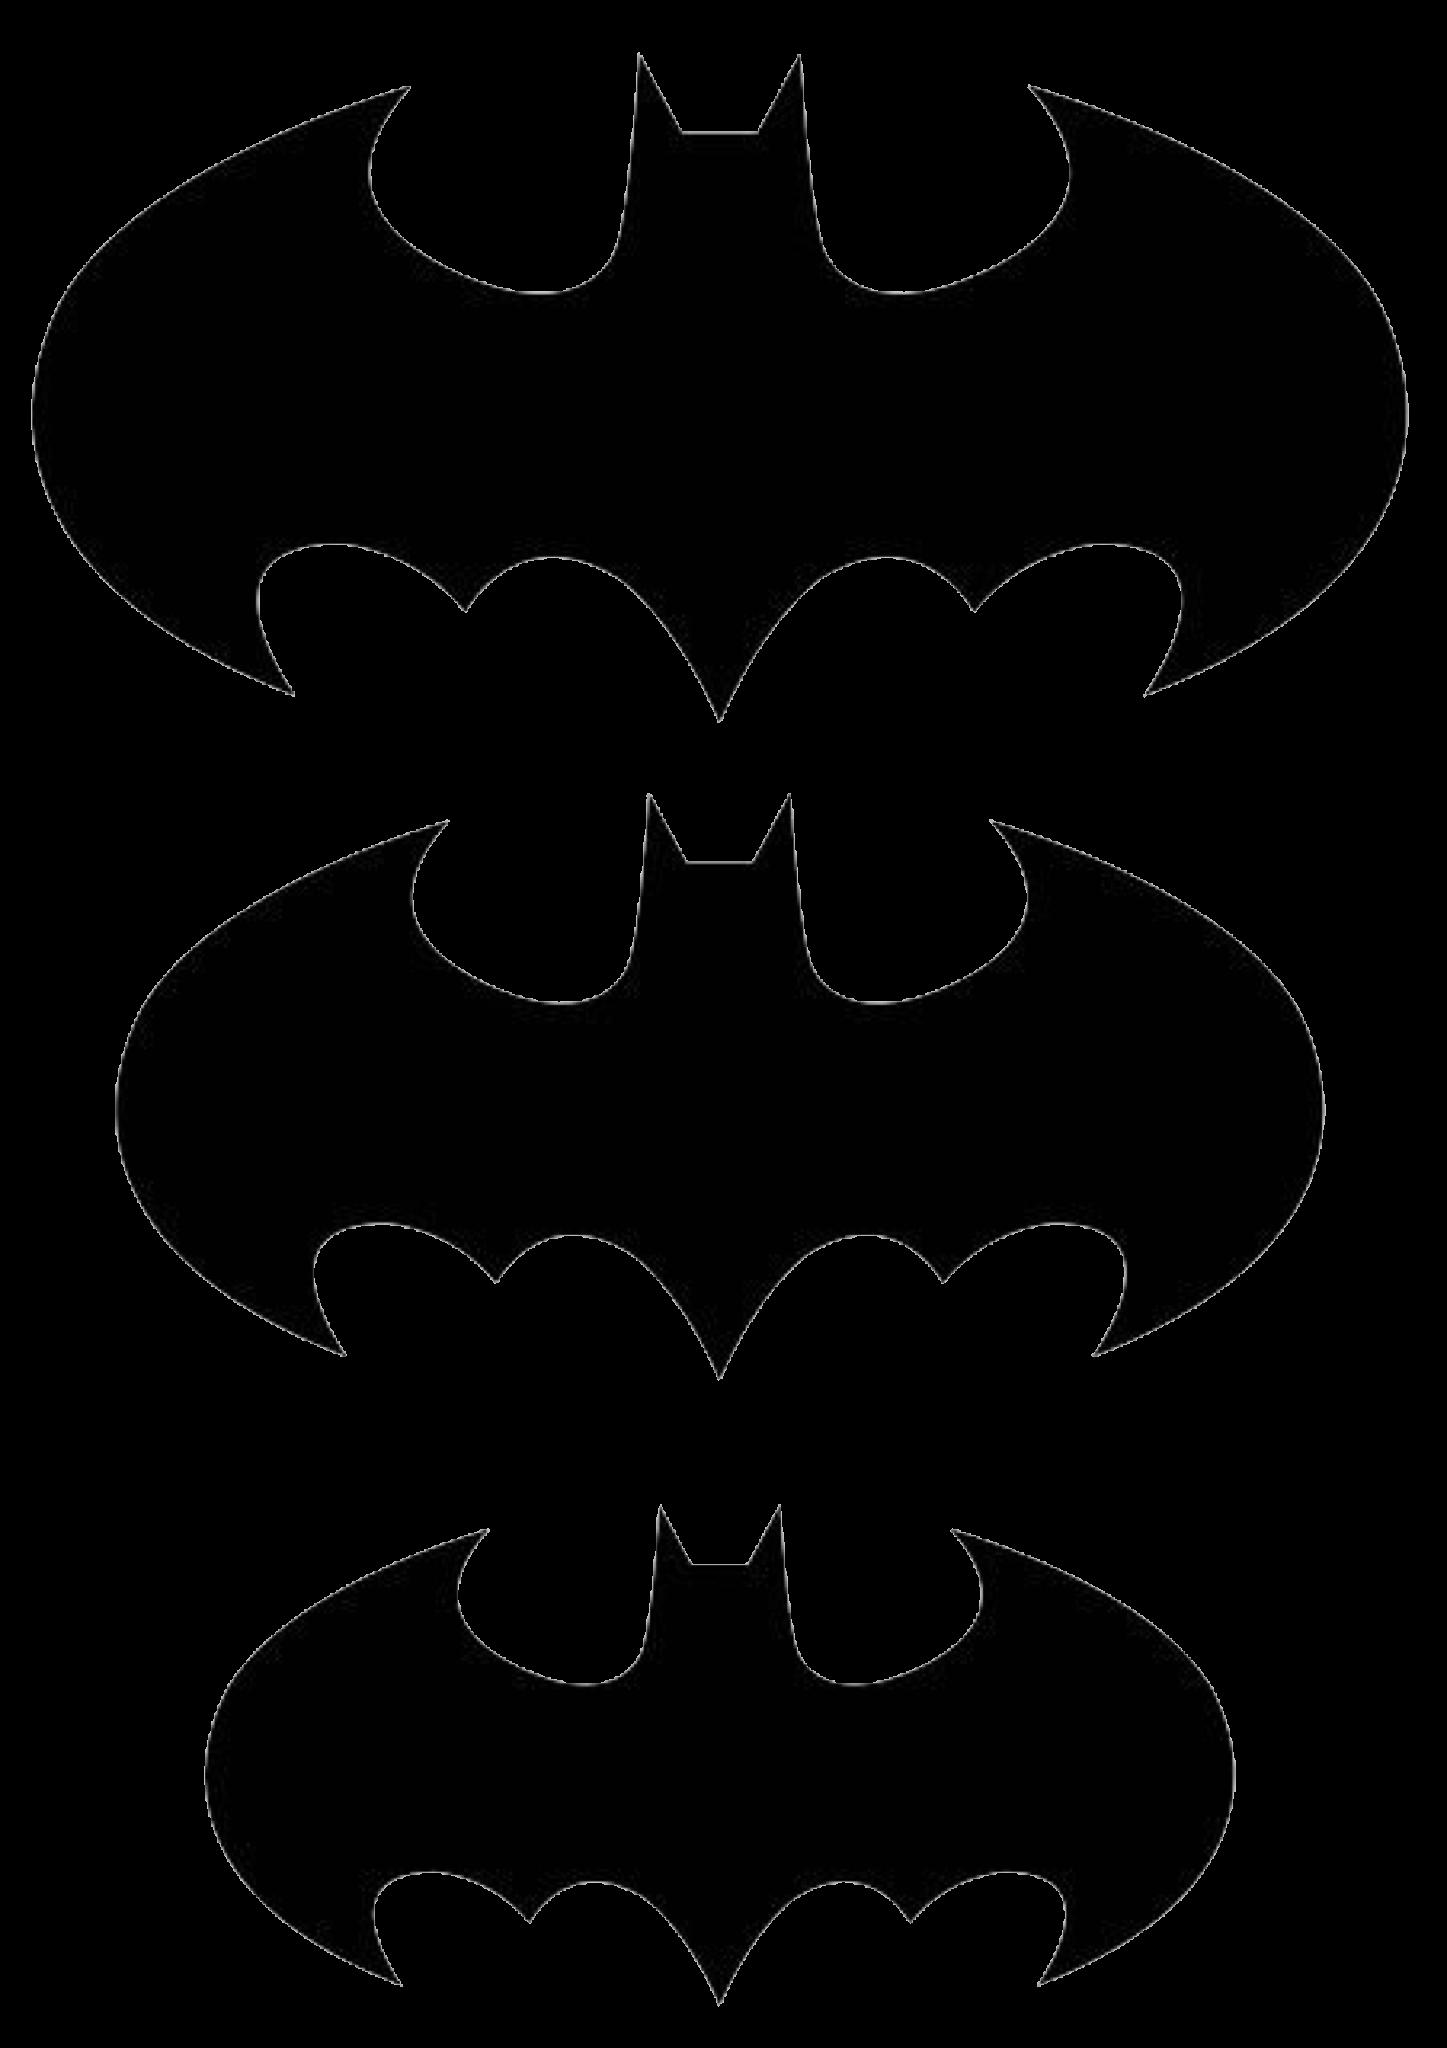 Pin By Mery Miranda On Png Lego Batman Birthday Lego Batman Party Batman Birthday